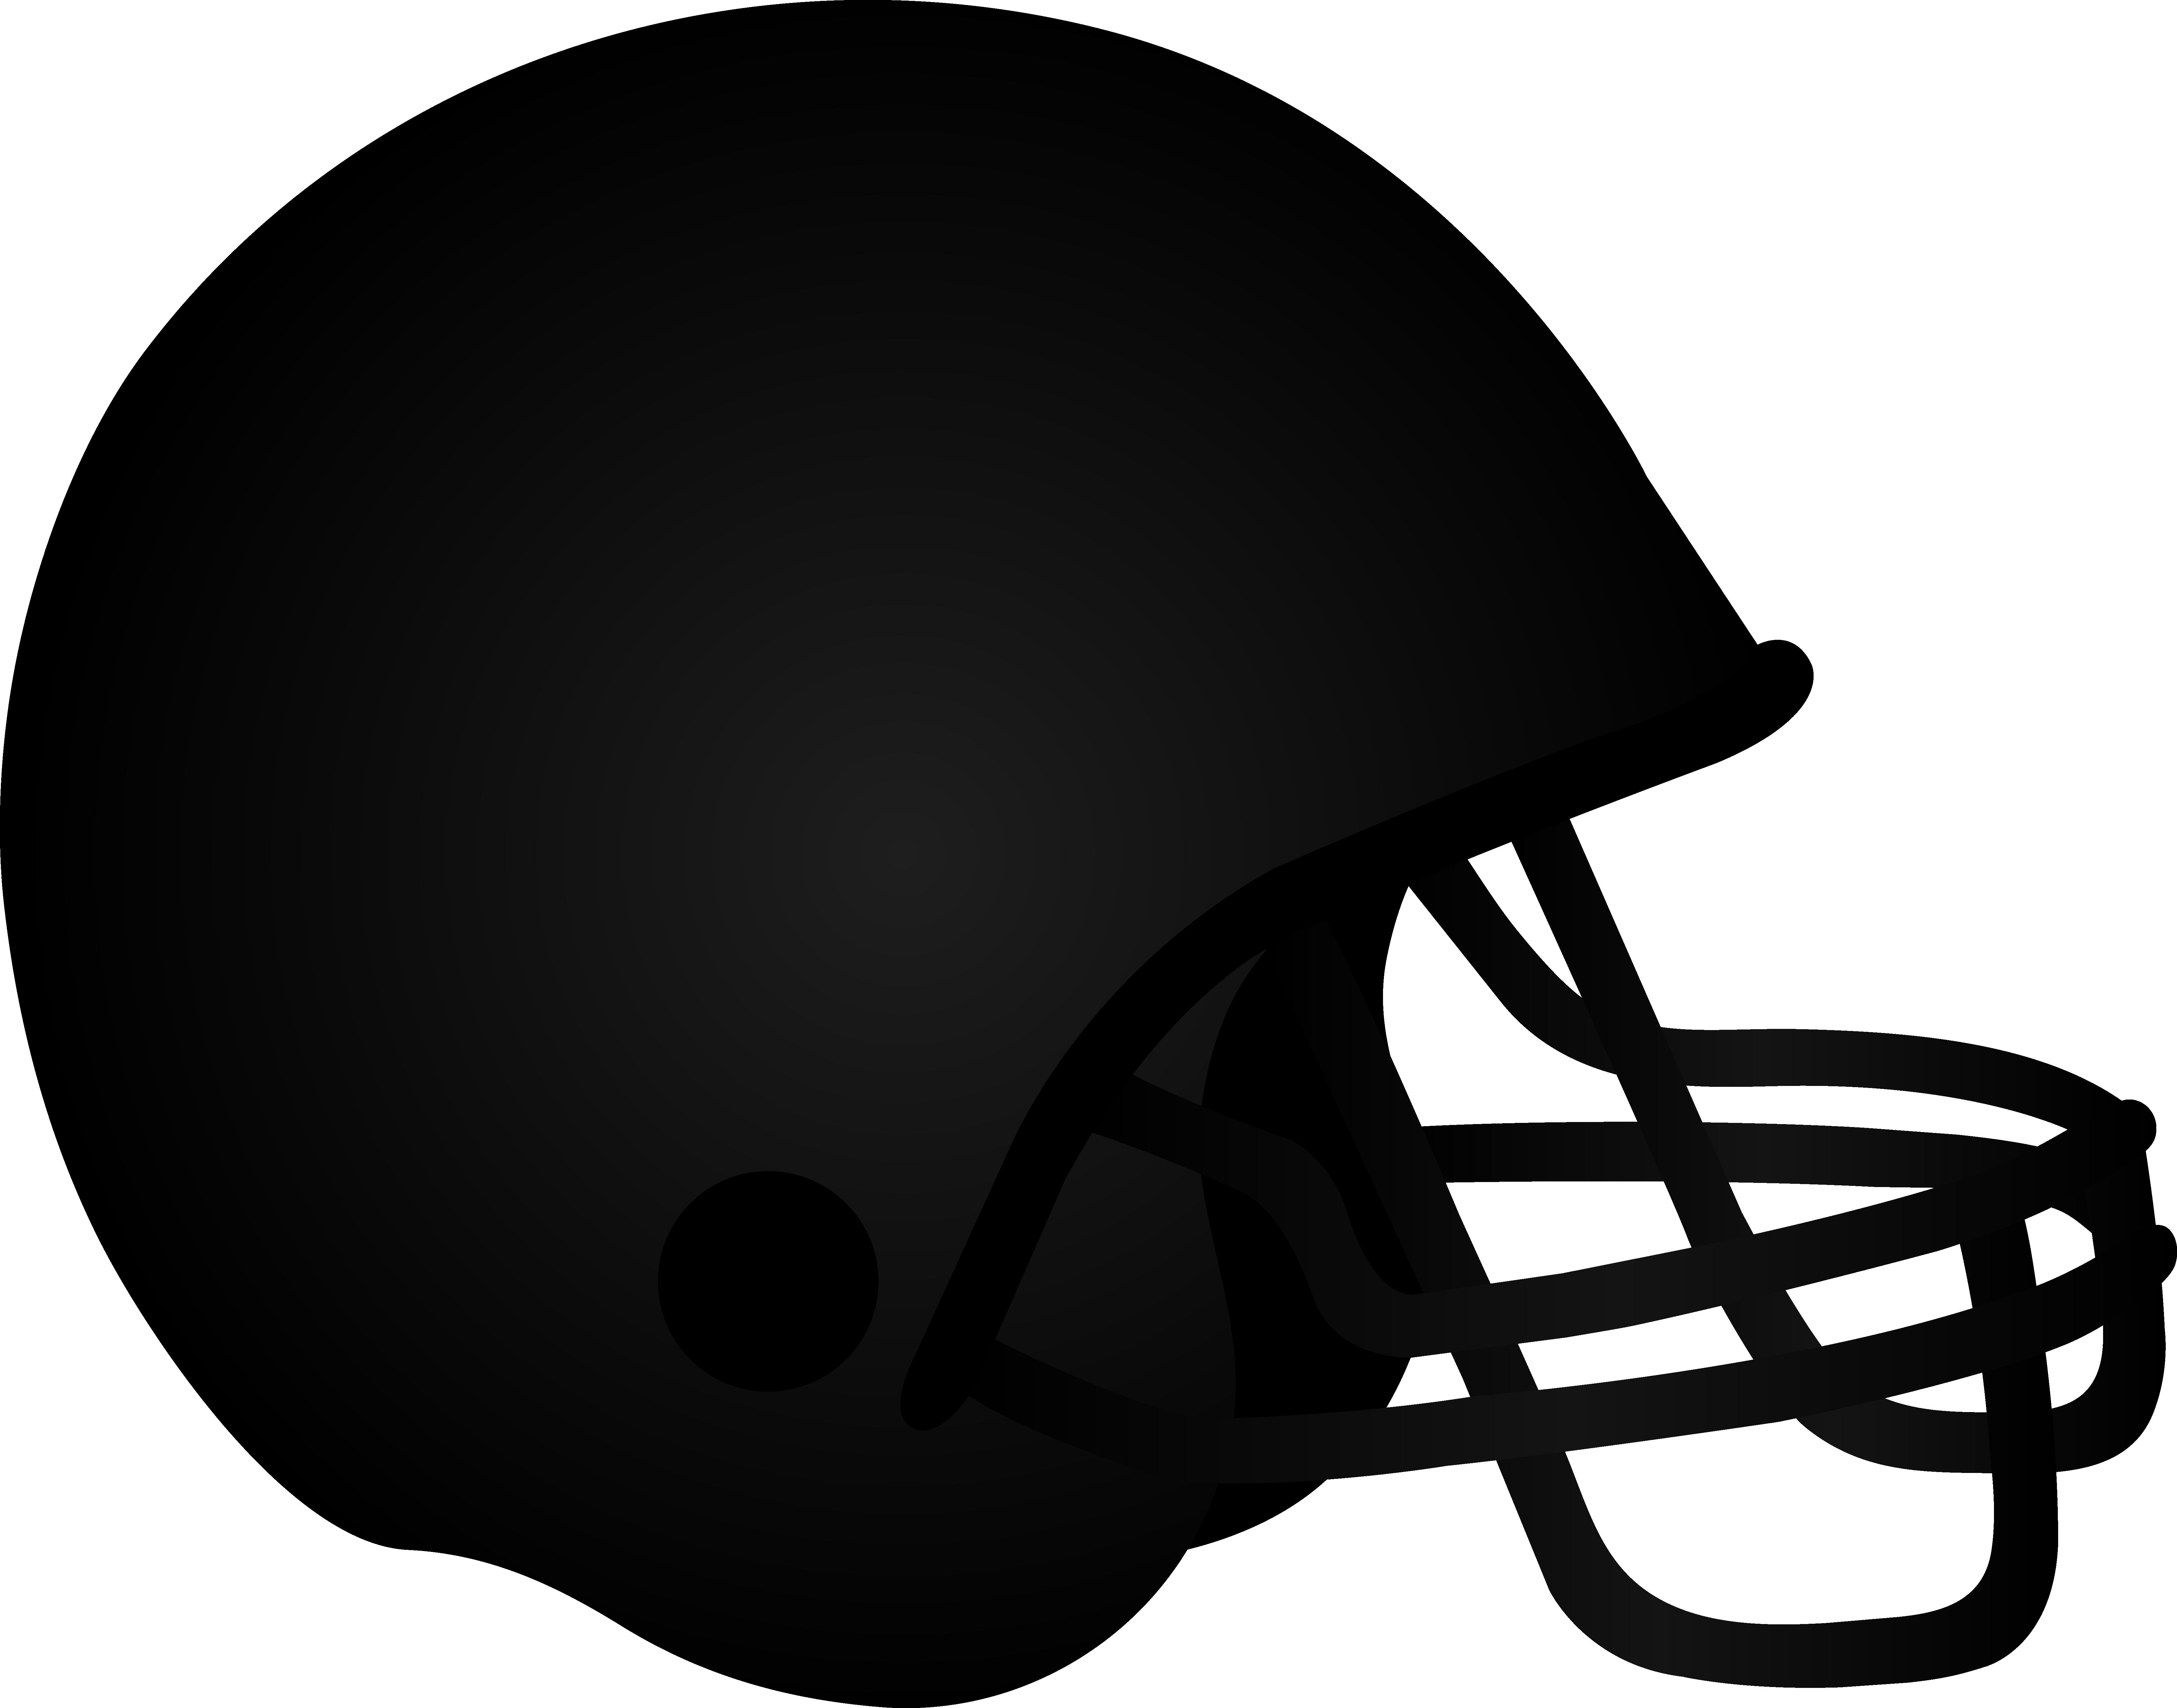 Free Football Helmet Clipart, Download Free Clip Art, Free